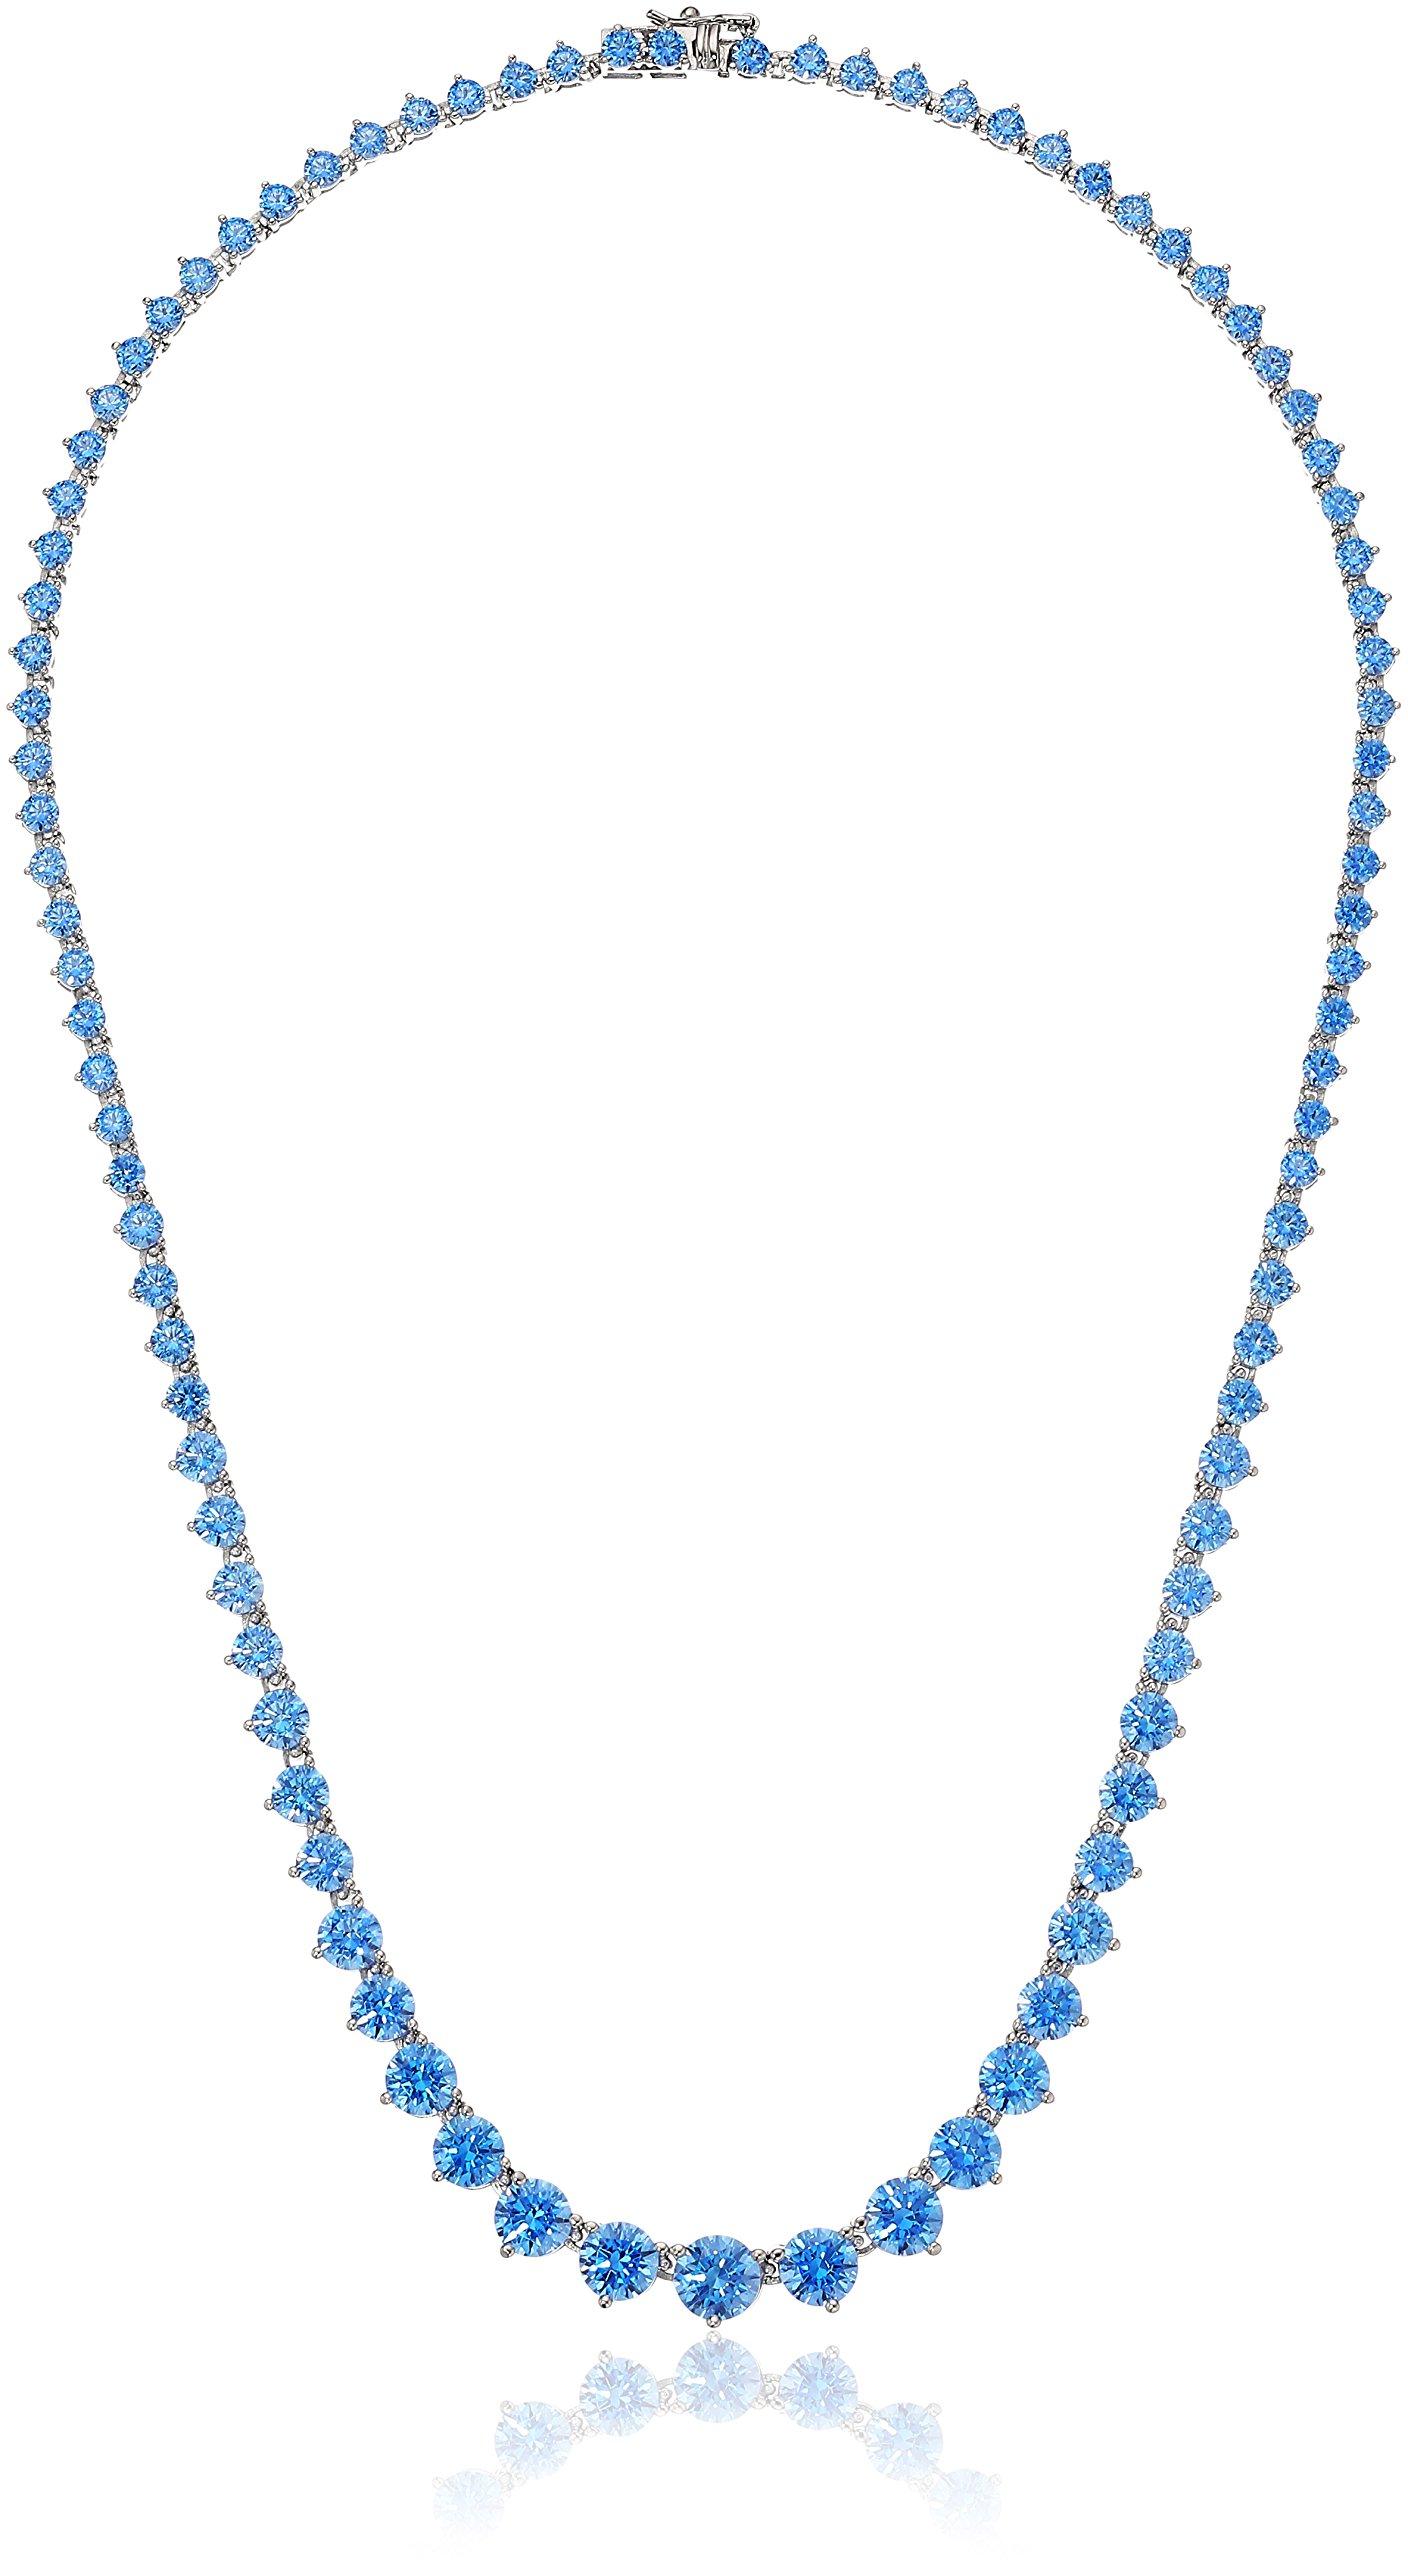 Platinum Plated Sterling Silver Swarovski Zirconia Artic Blue Round-Cut Graduated Riviera Necklace, 17''